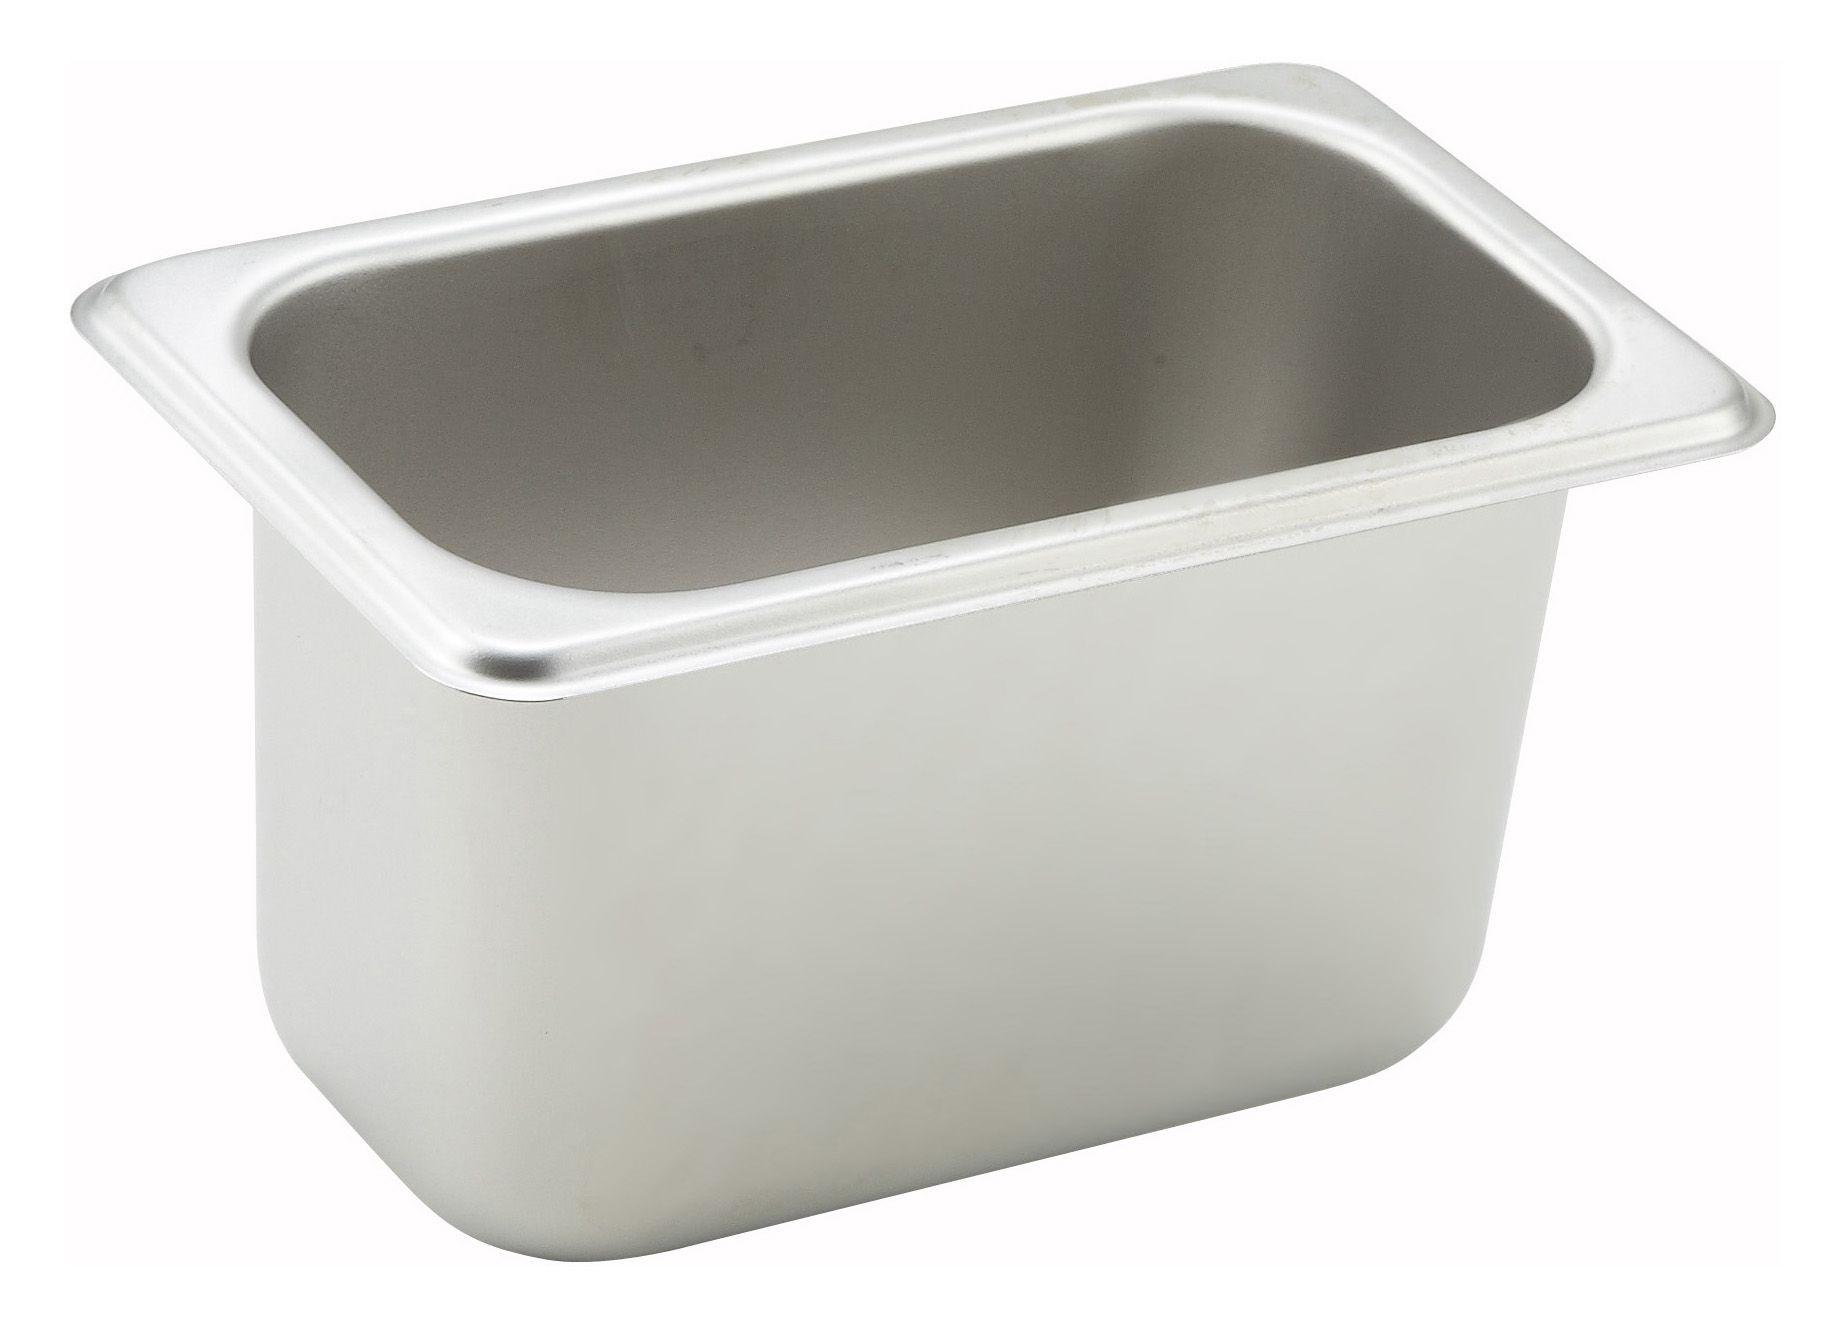 "Winco SPN4 1/9 Size Standard Weight Steam Table Pan 4"" Deep"